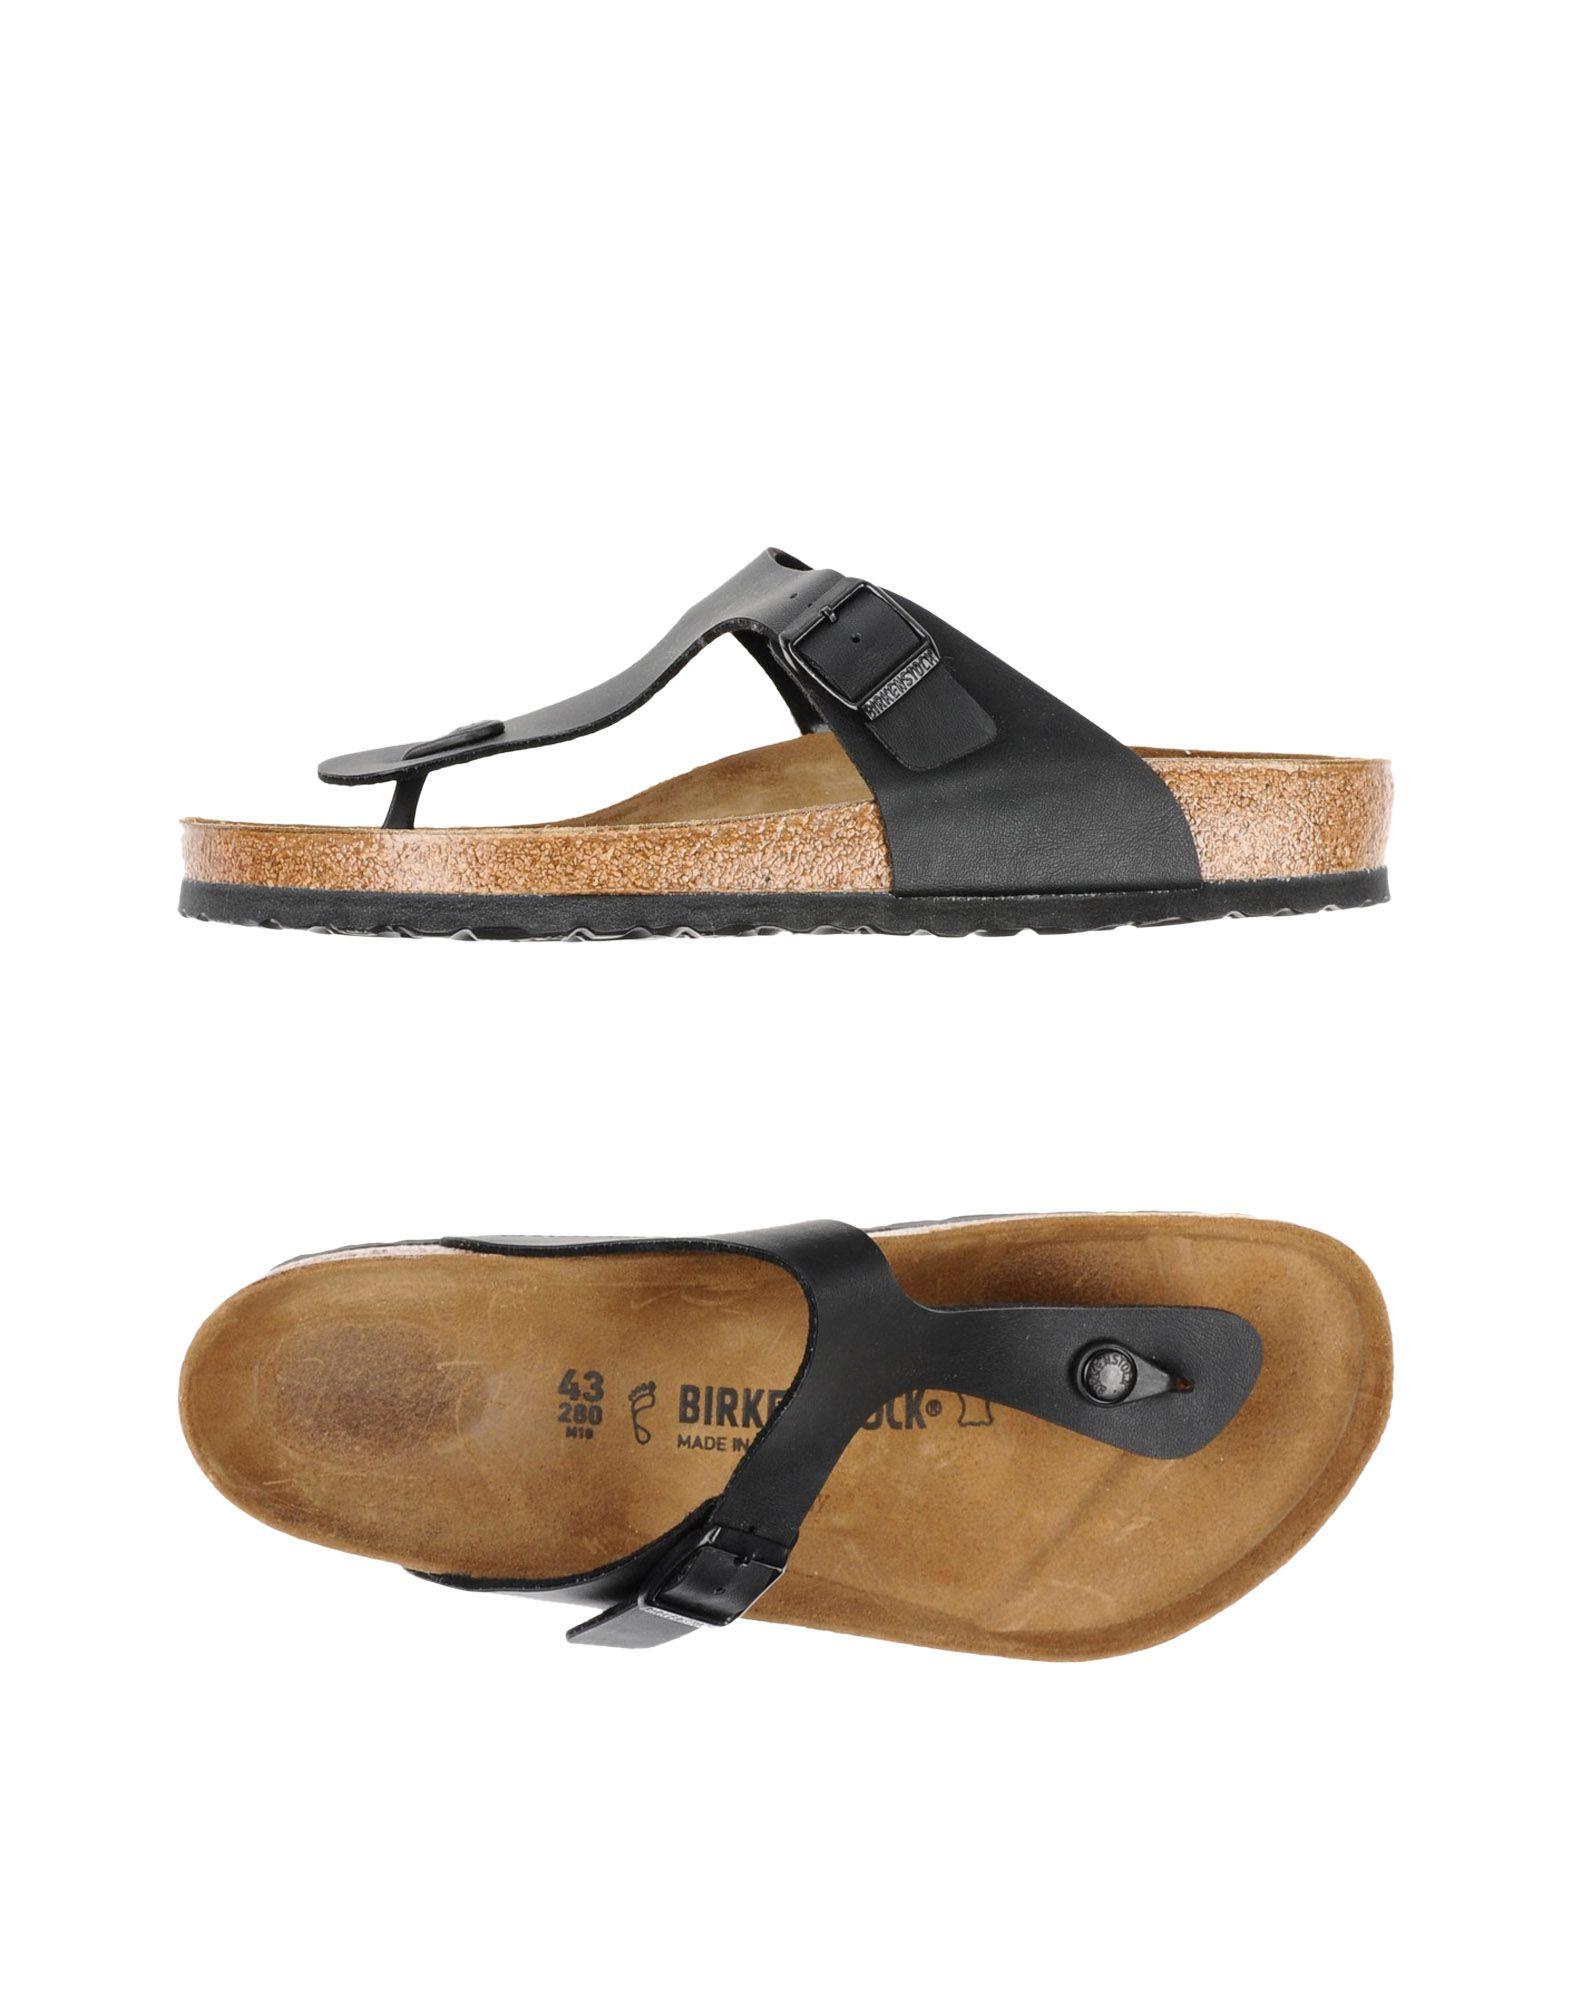 c79af9a6f Birkenstock Flip Flops - Men Birkenstock Flip Flops online on YOOX ...